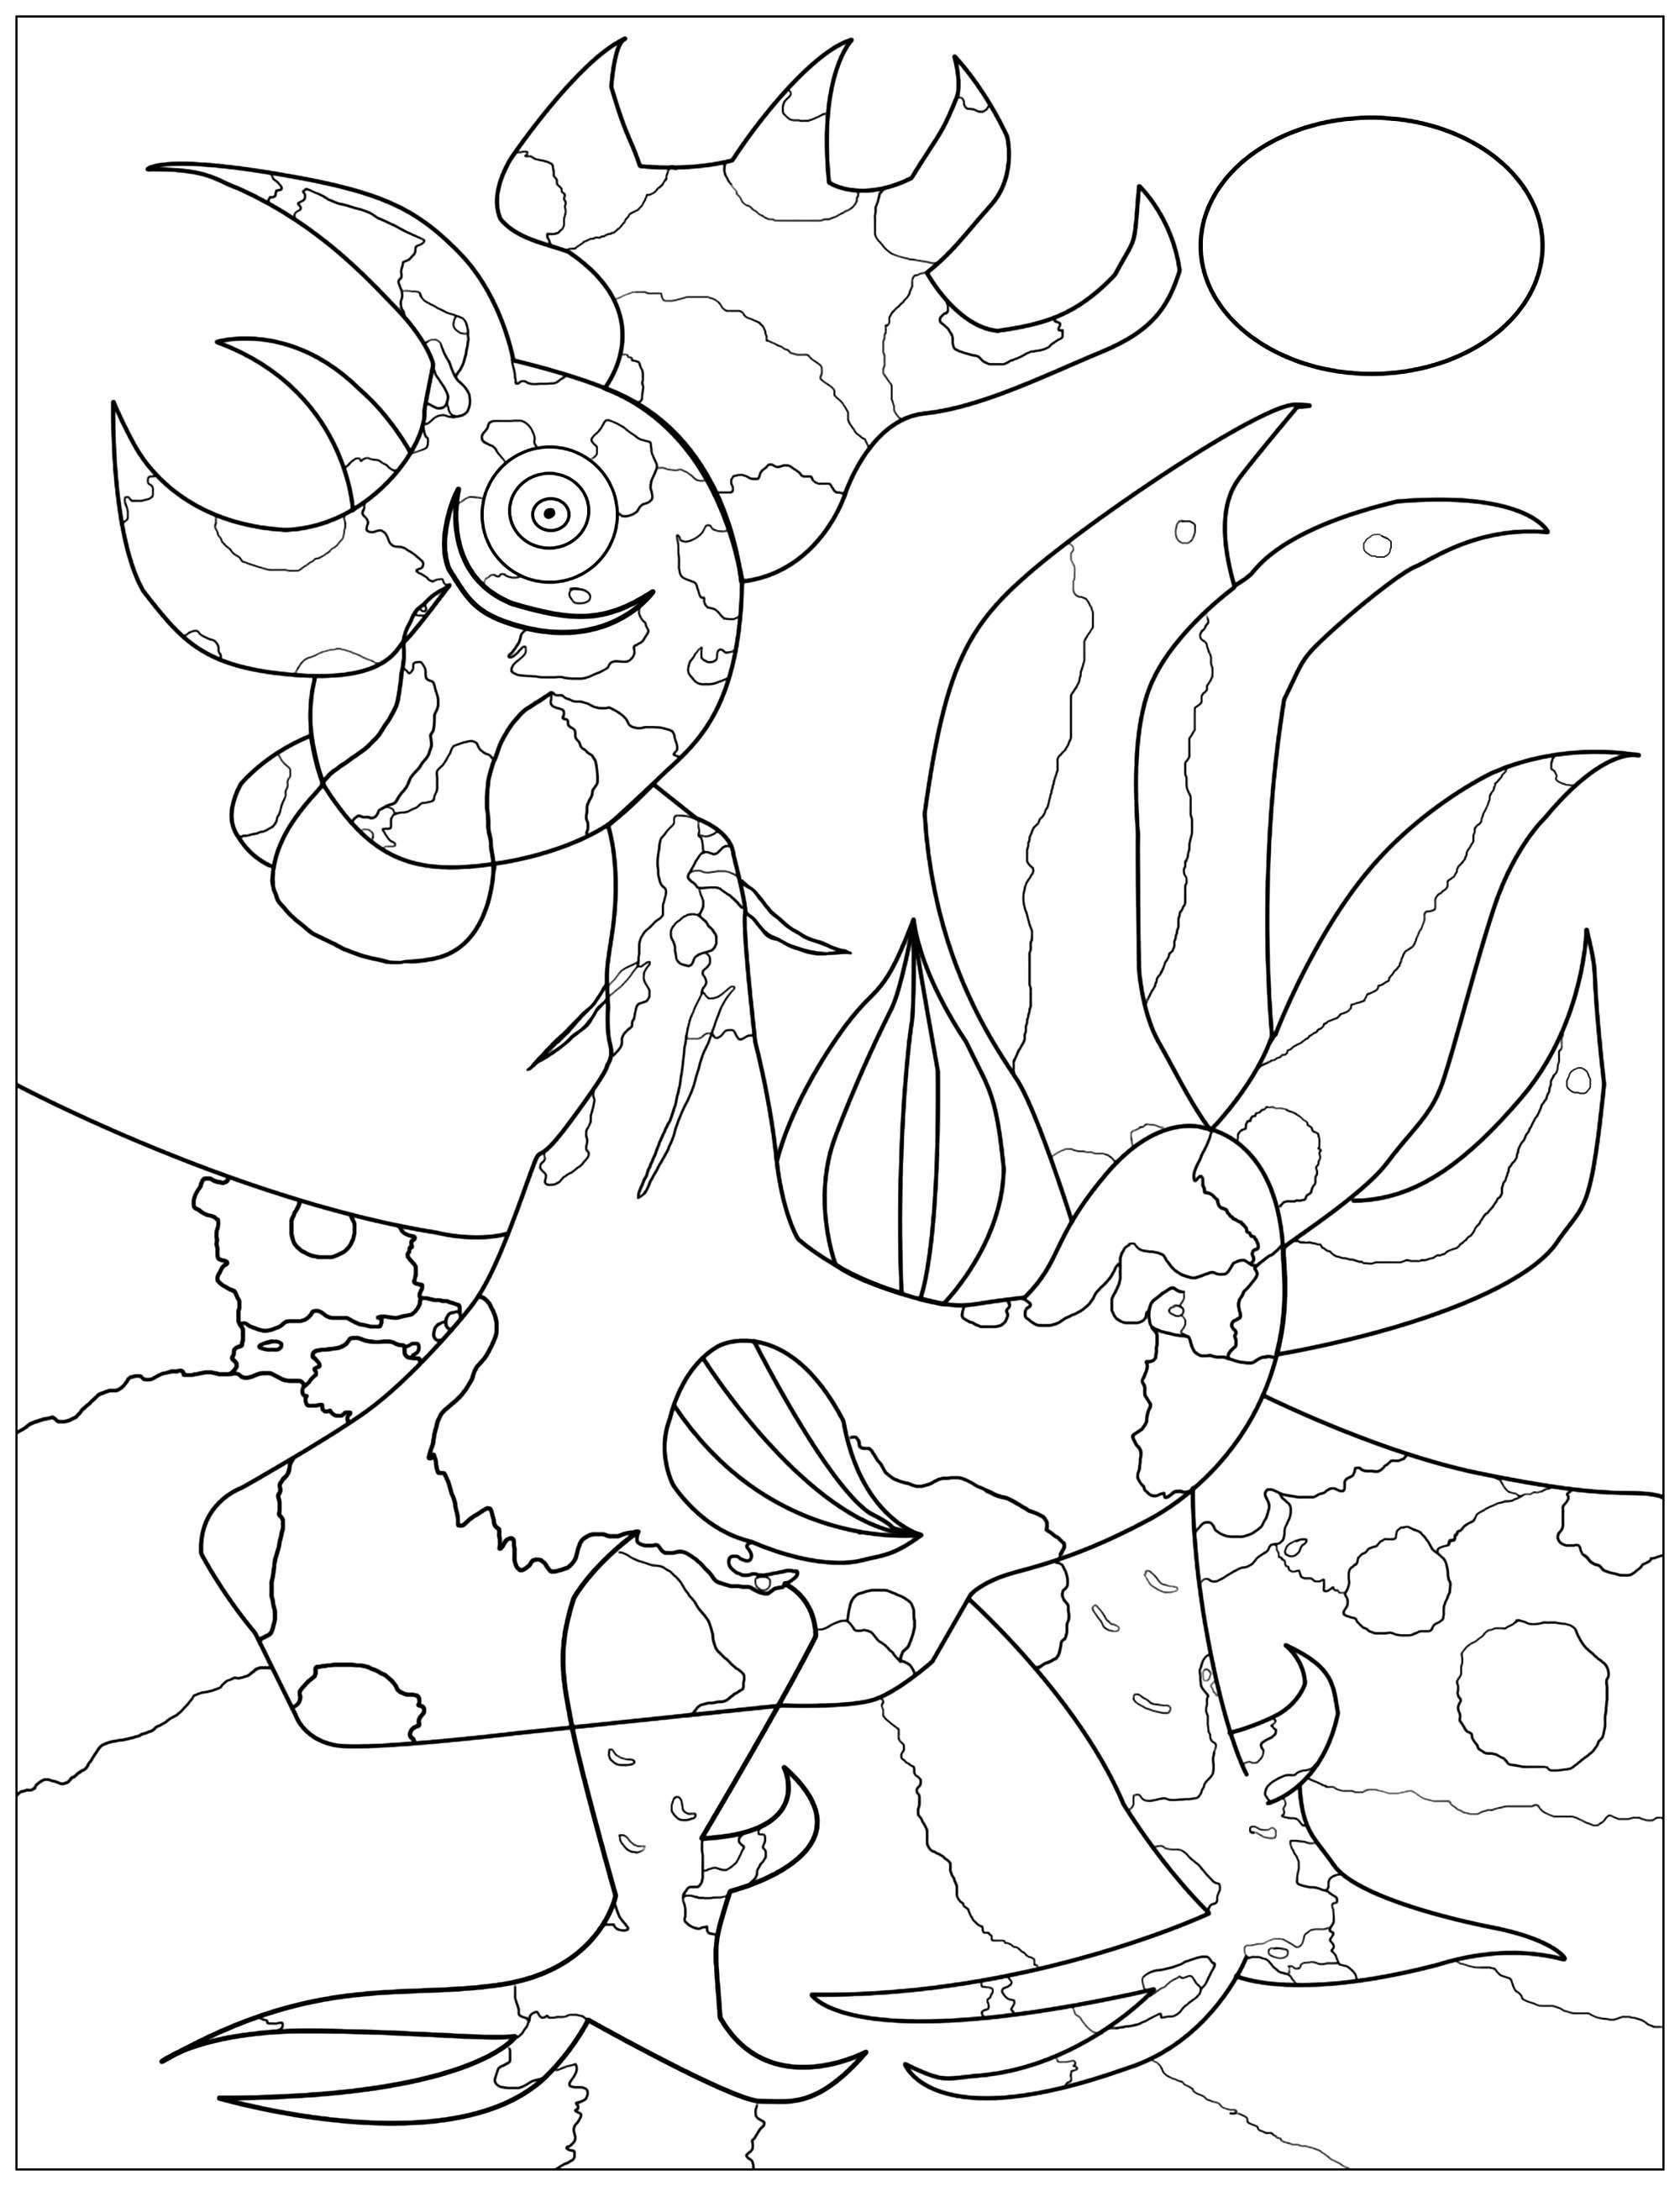 Disegni da colorare per adulti : Opera d arte - 96